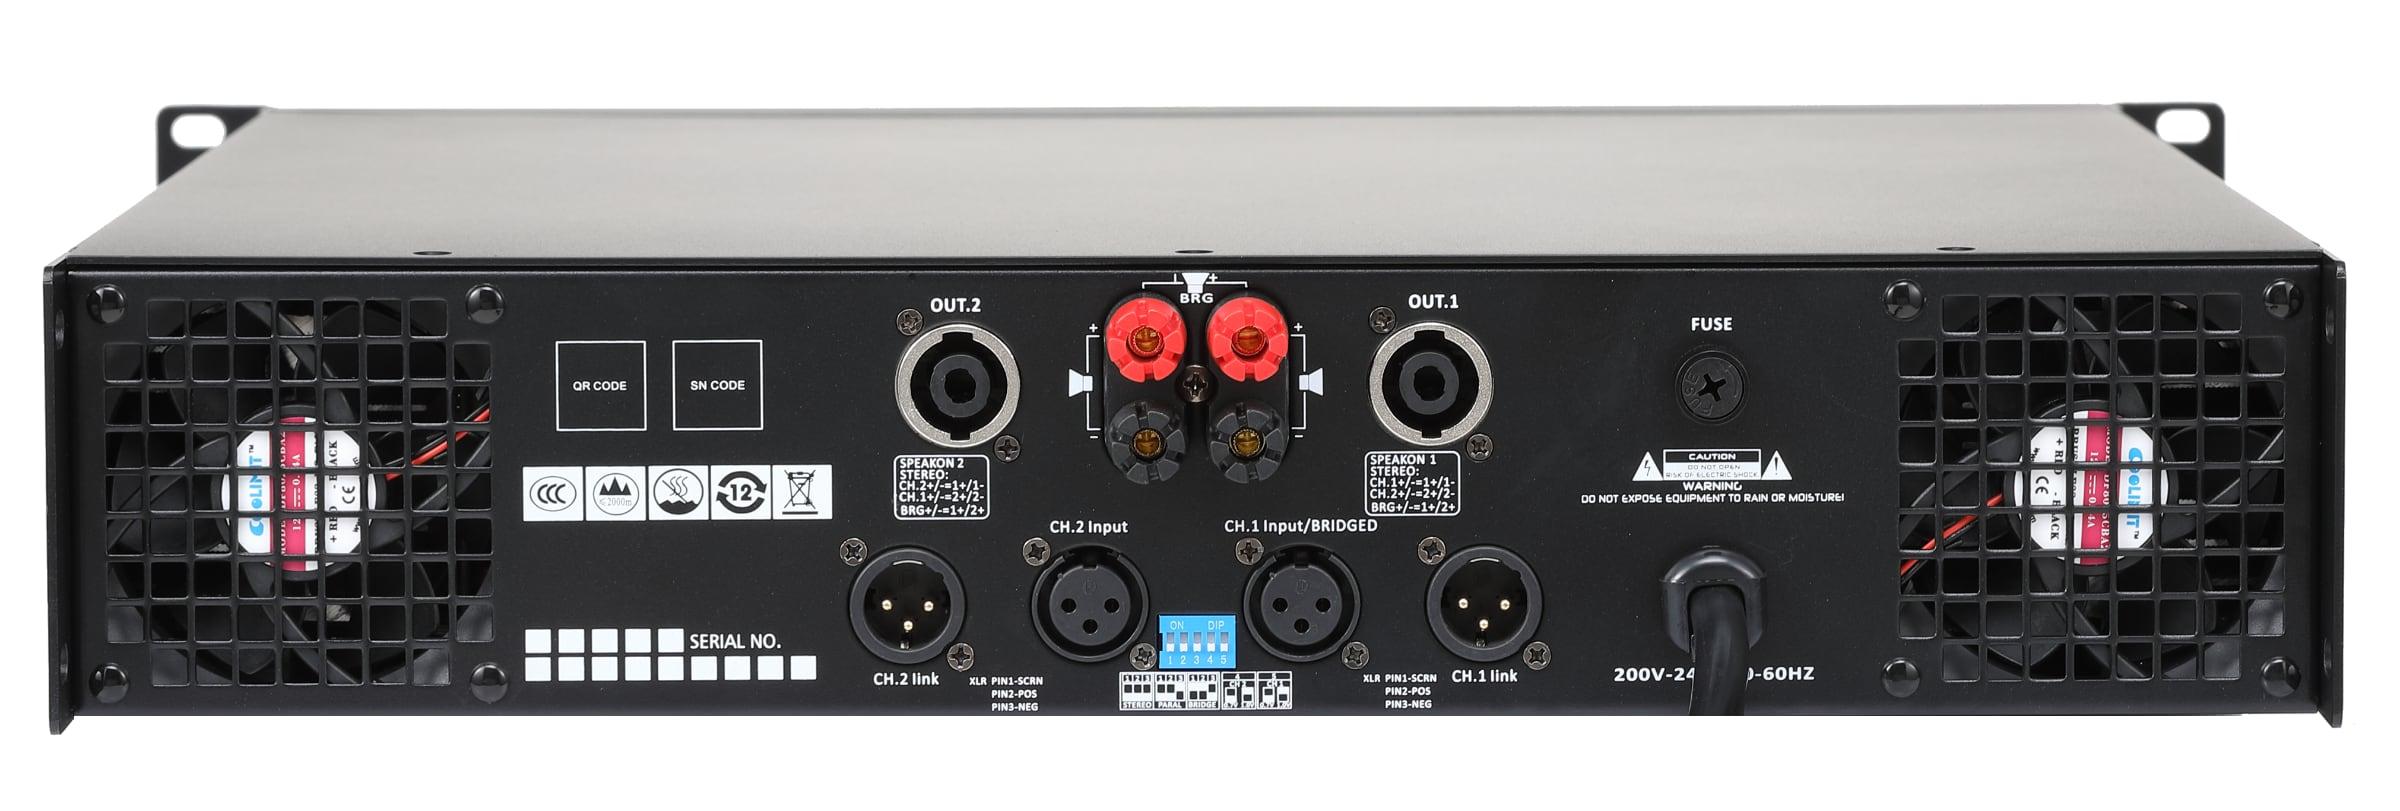 Công suất AAP TD-3002